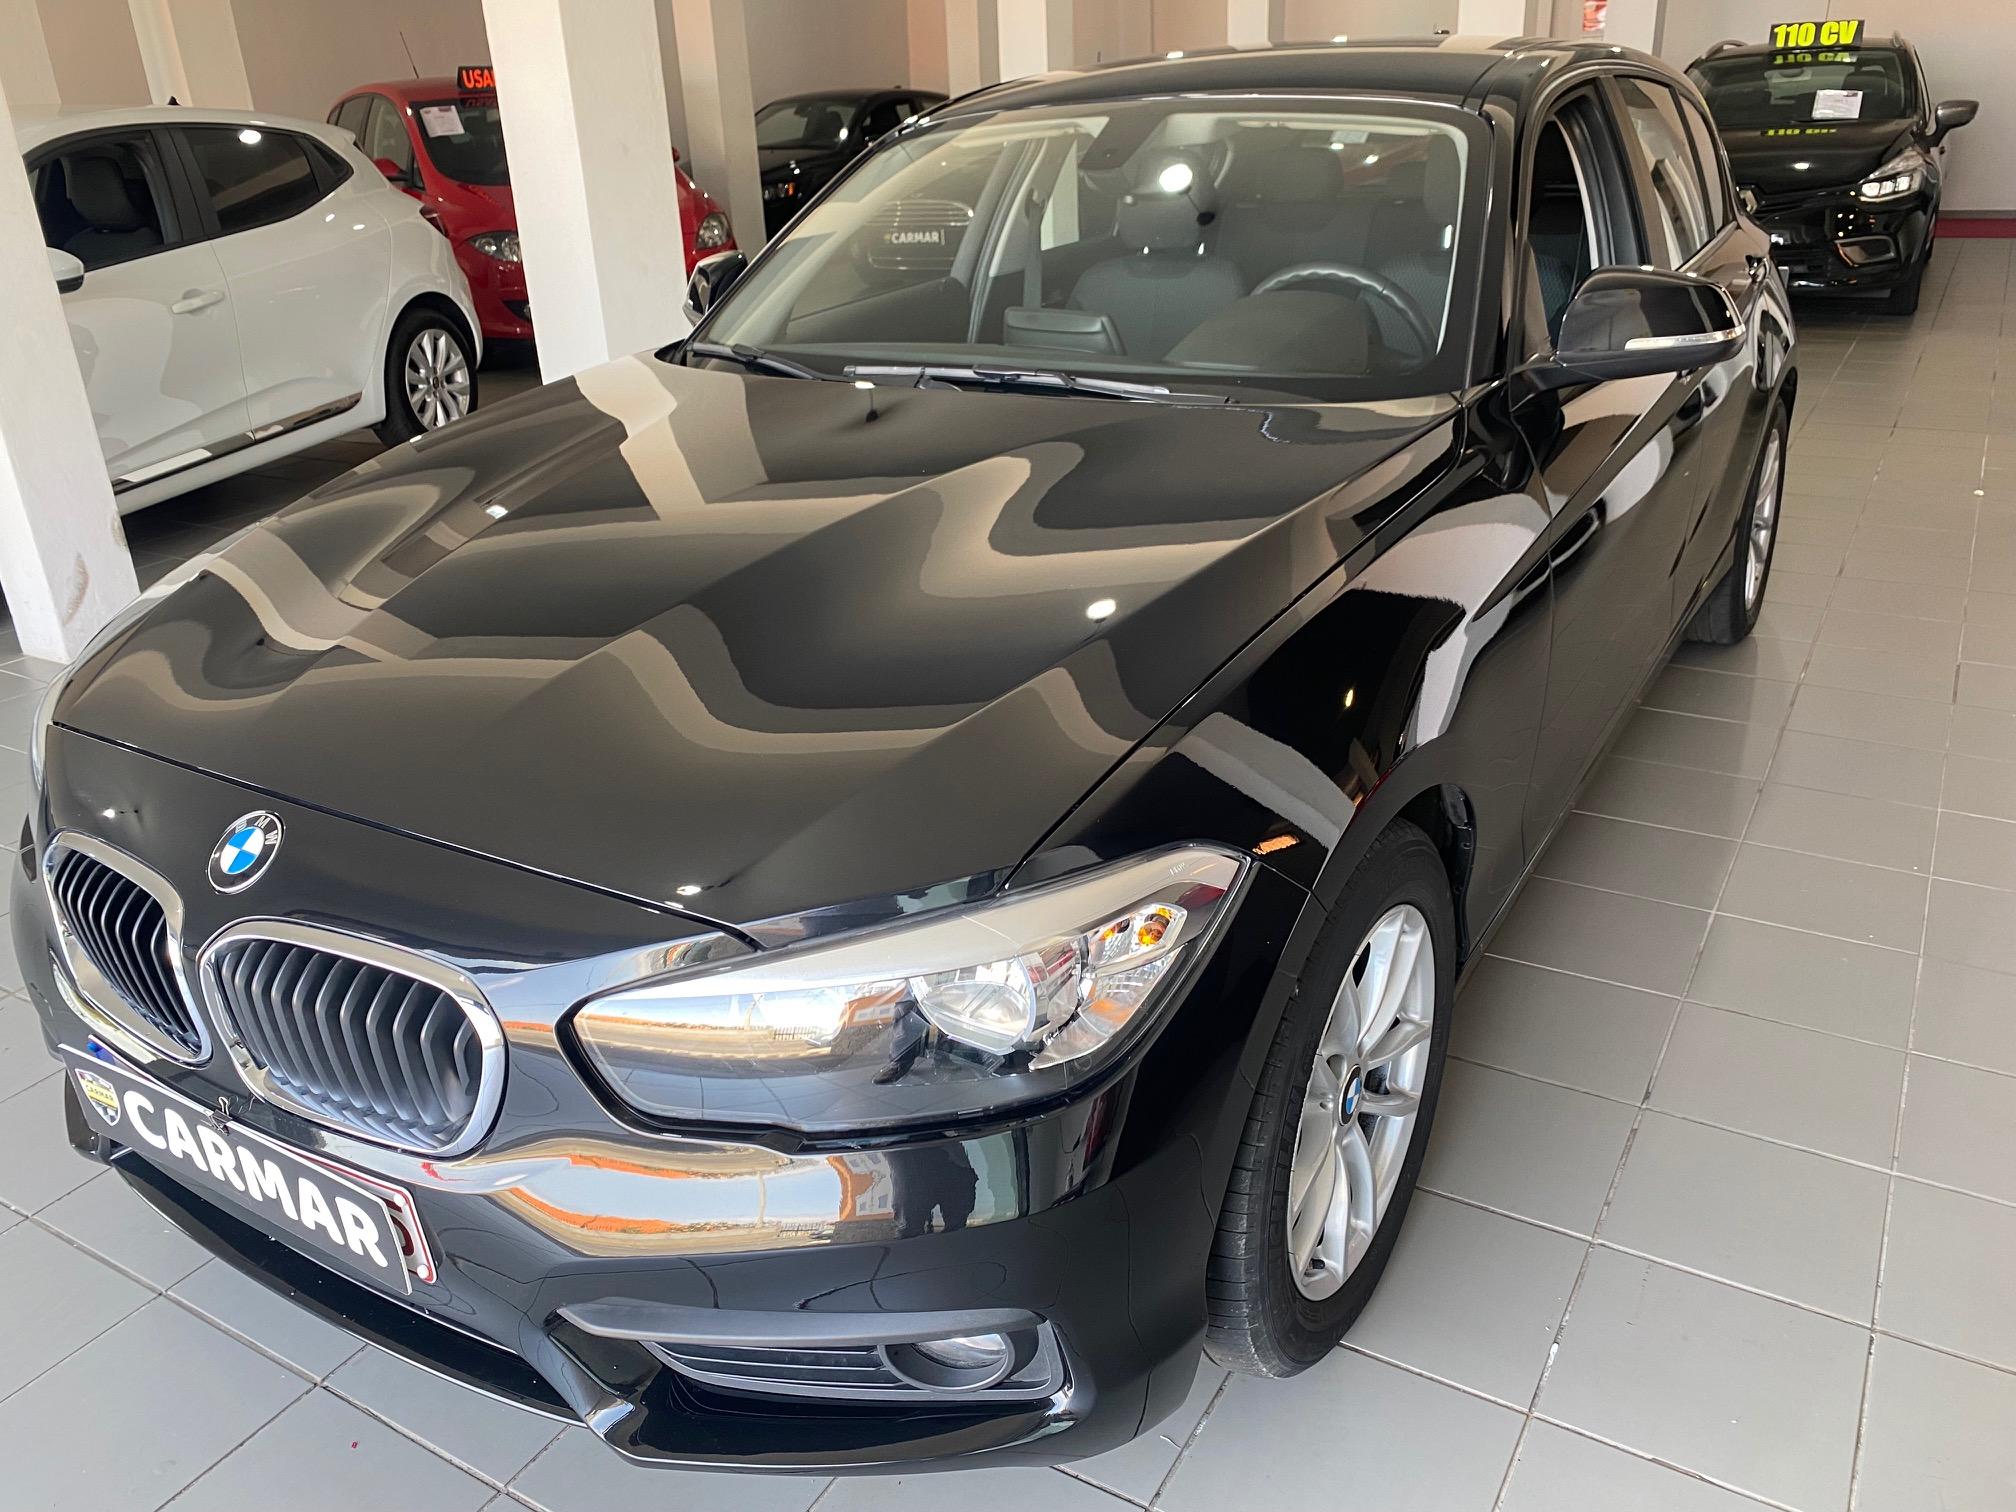 BMW 116 D EfficientDynamics Edition – 116 CV – de 2017